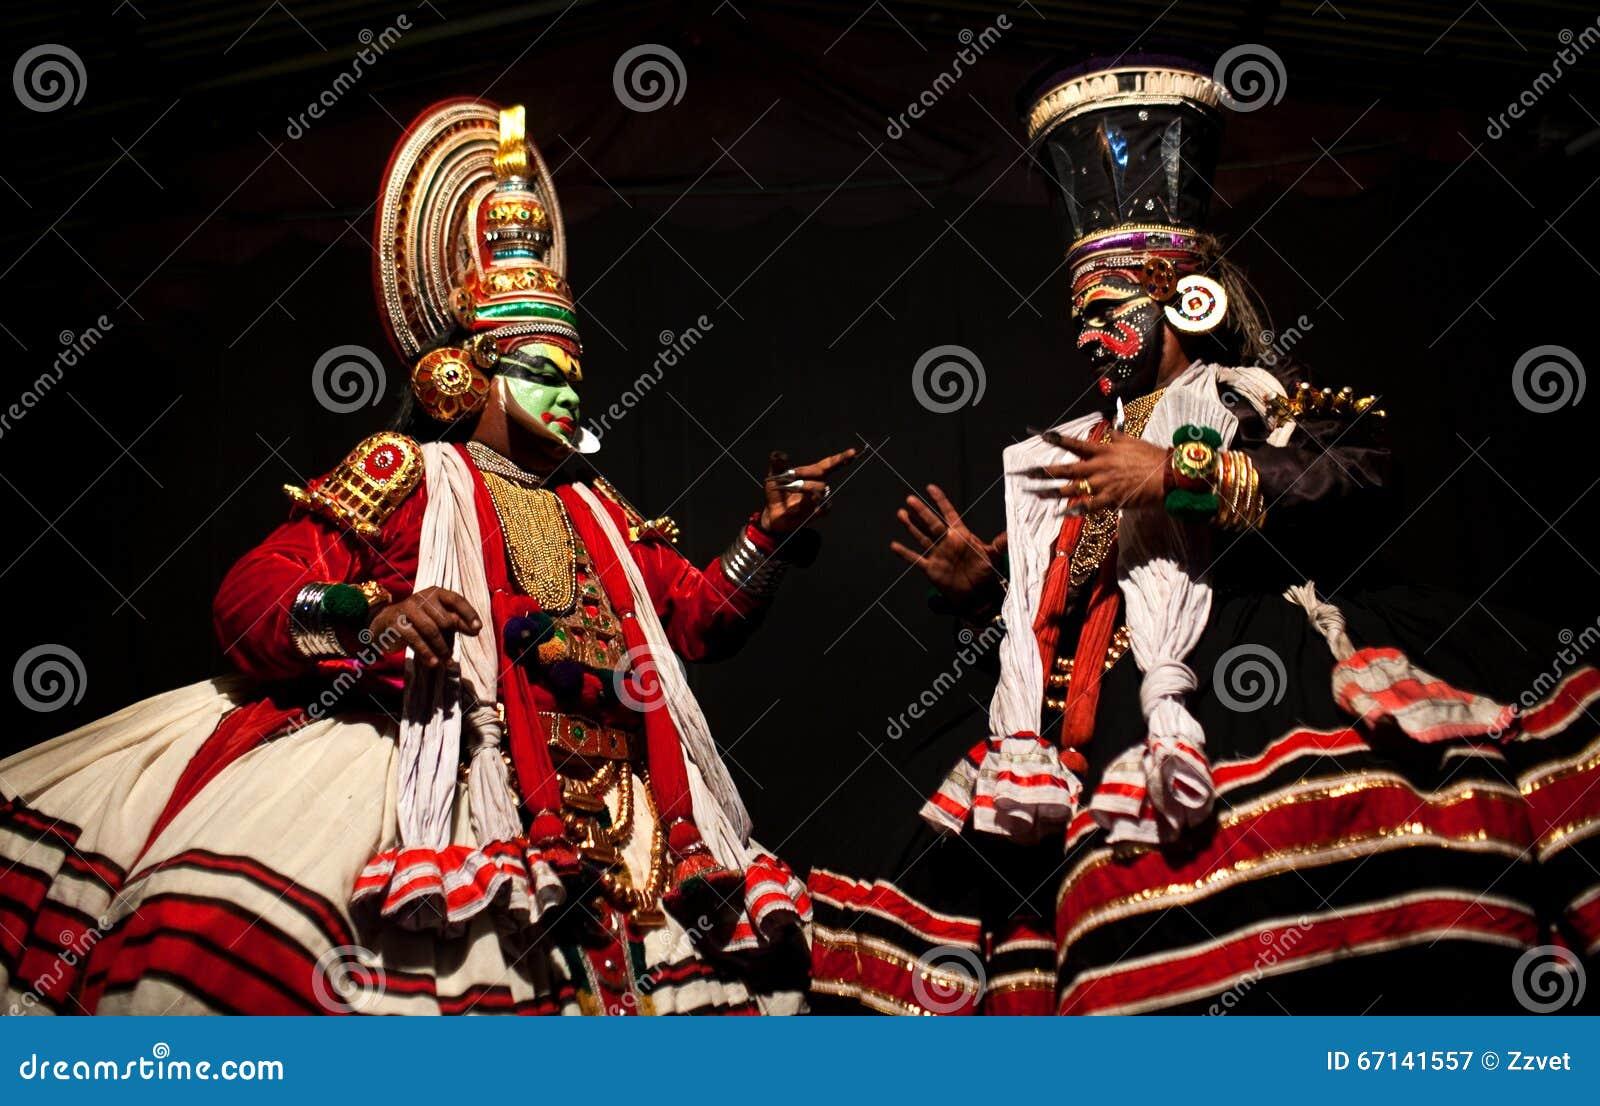 Kathakali Dance In Kerala, India Editorial Photography